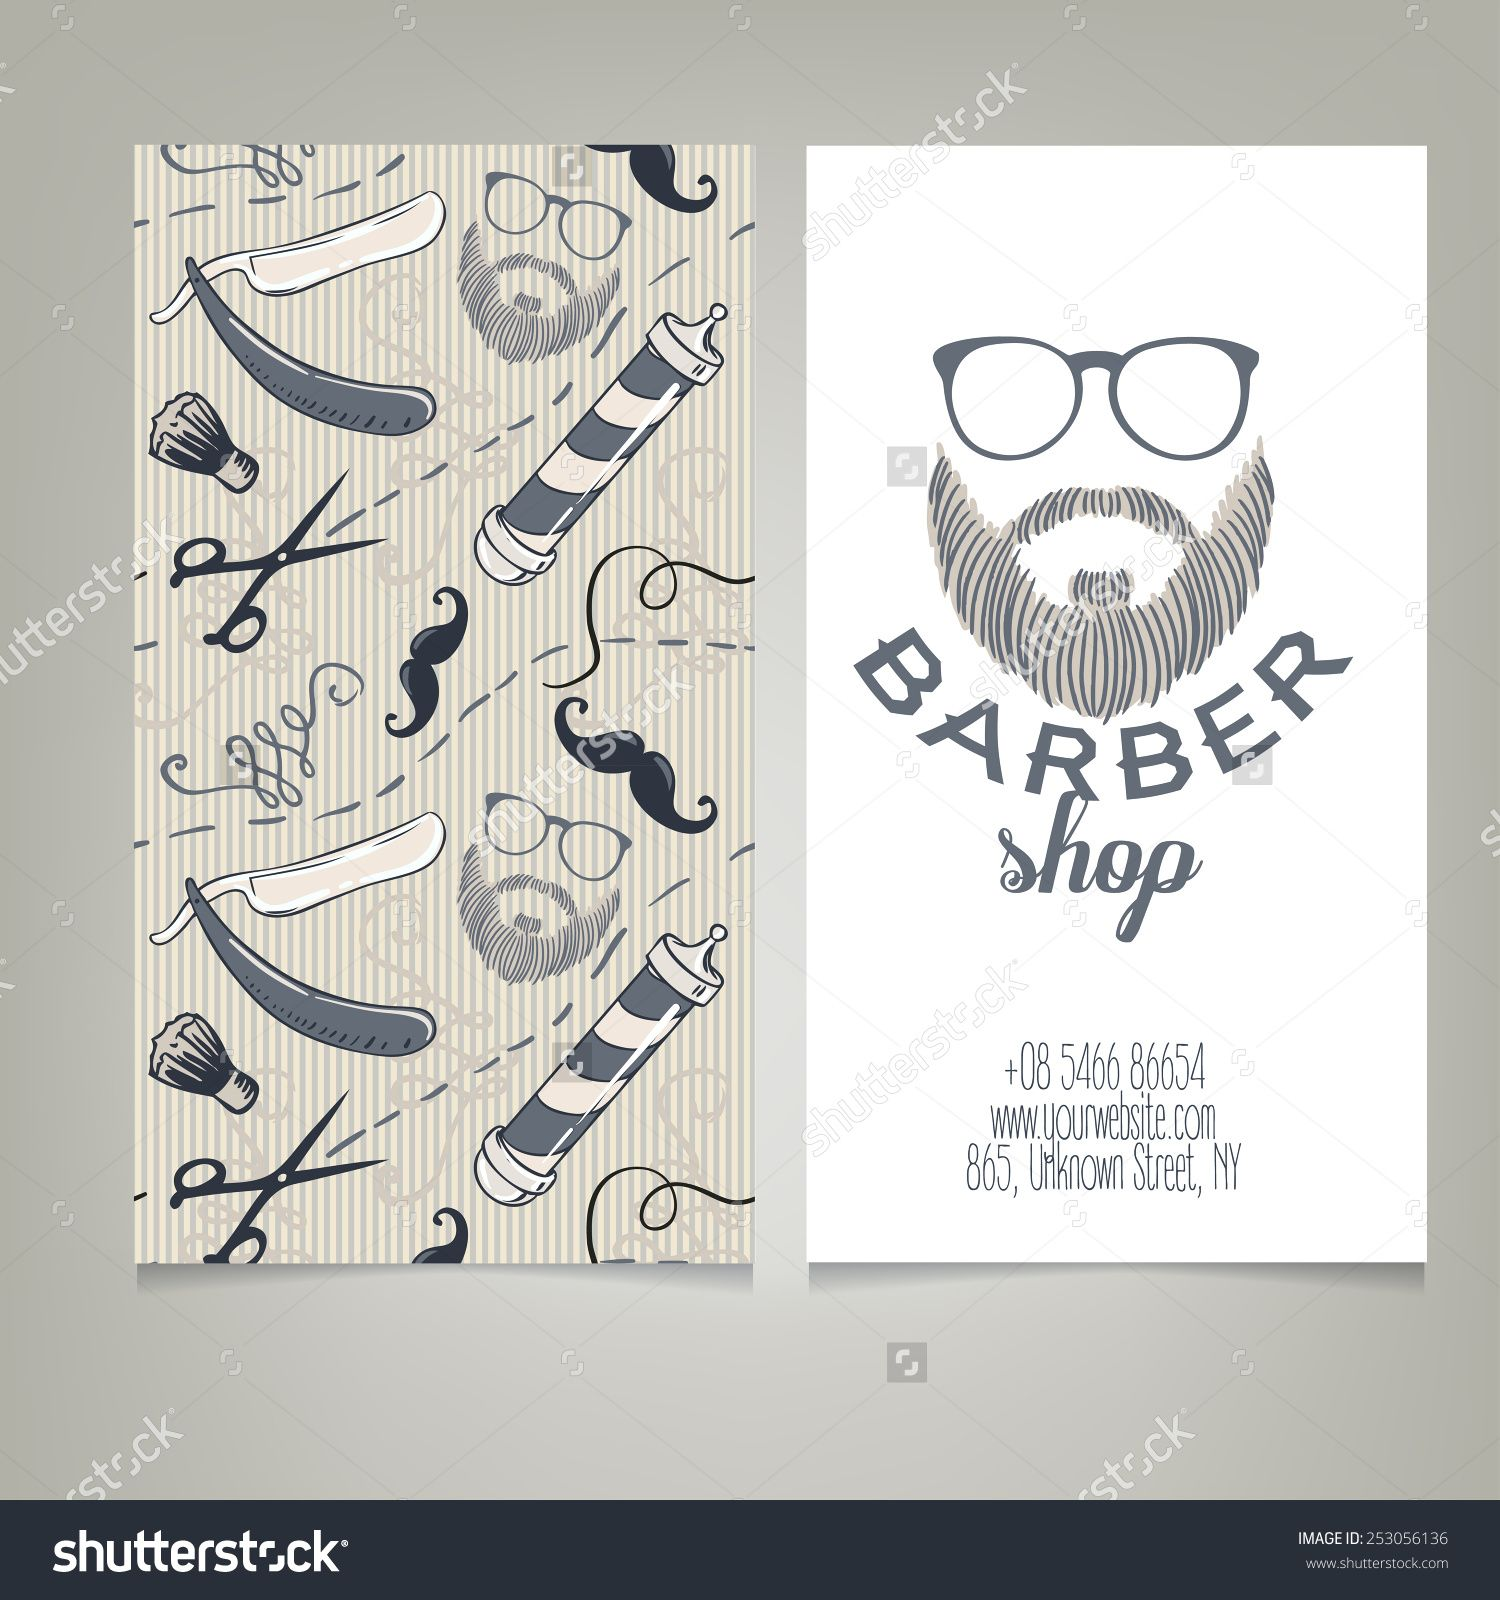 Hipster barber shop business card design template vector hipster barber shop business card design template vector illustration fbccfo Image collections